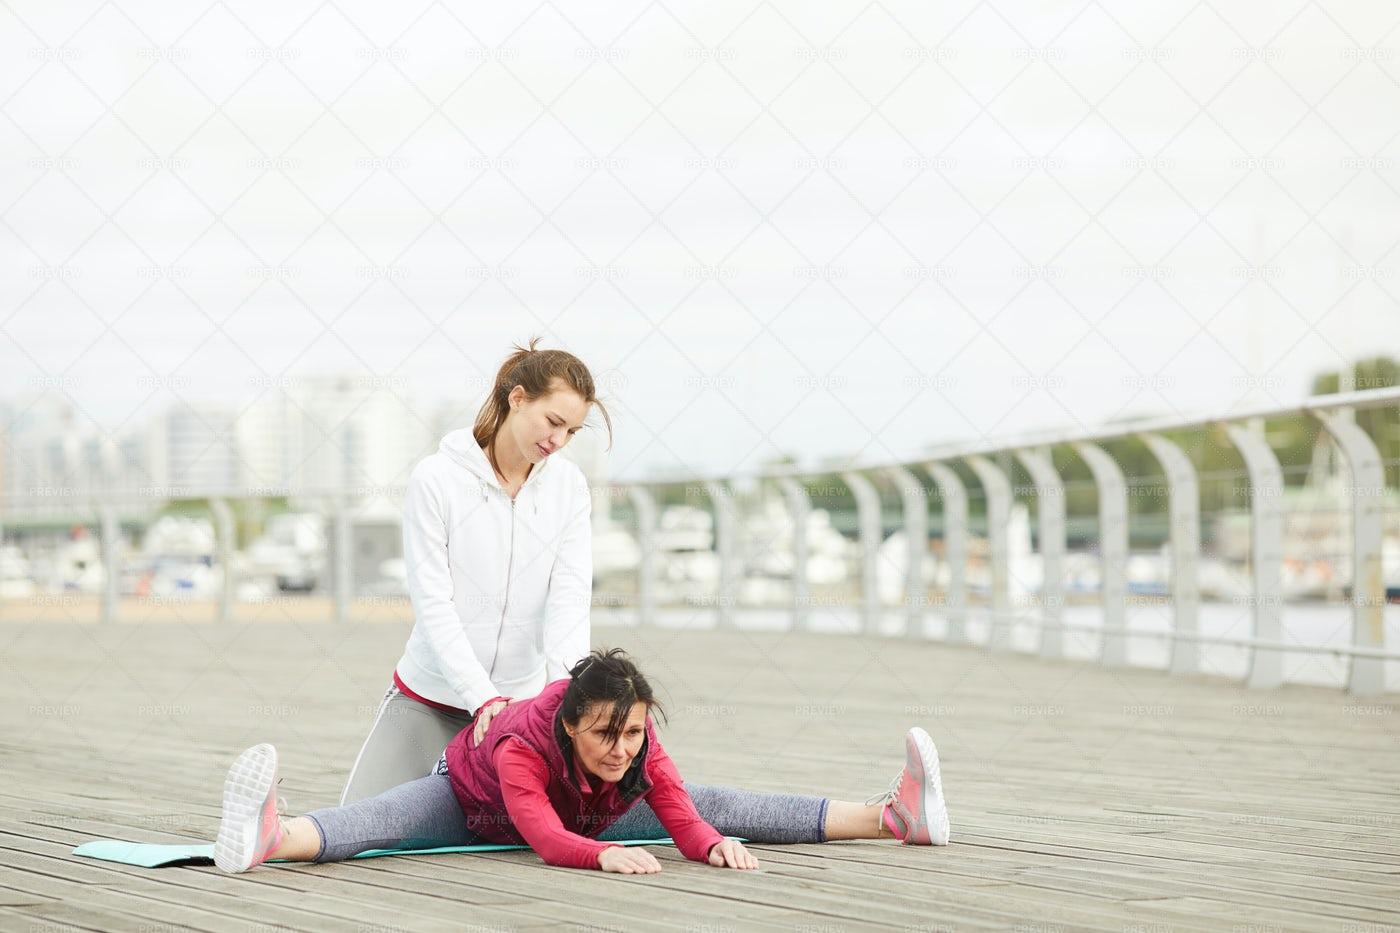 Mature Woman Stretching Legs: Stock Photos